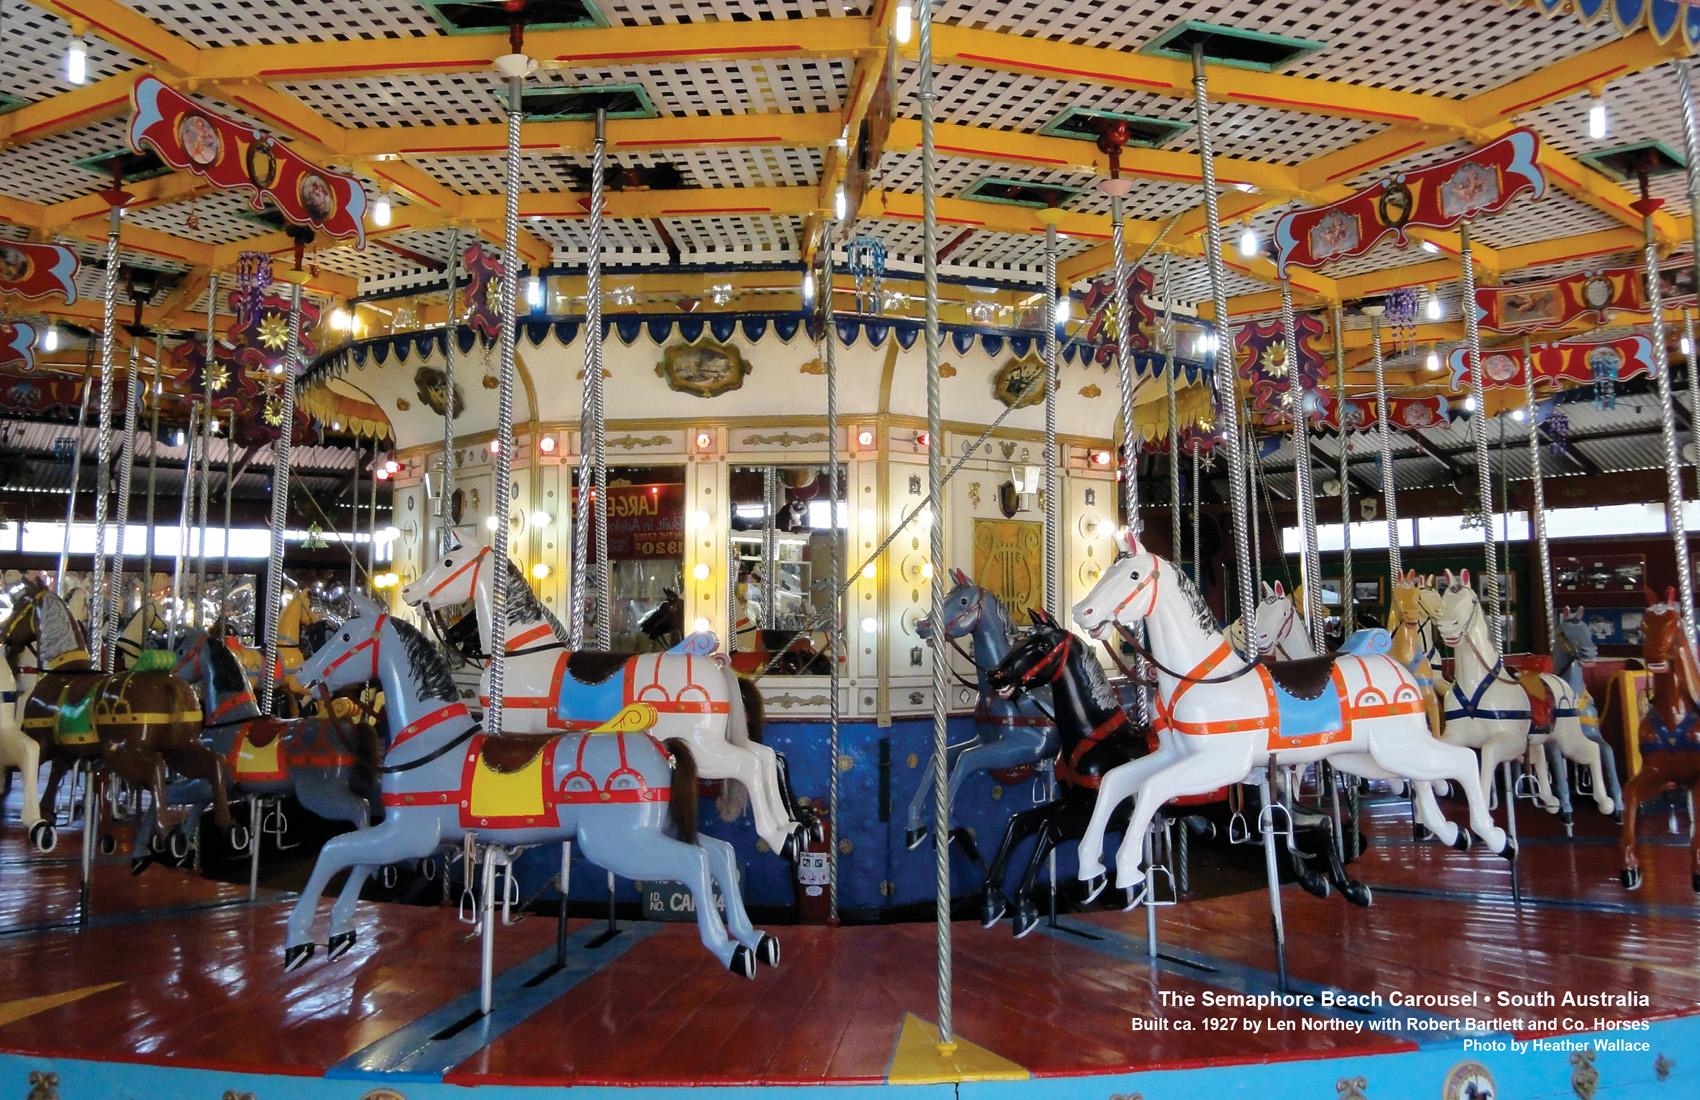 Historic-Semaphore-Beach-carousel-Australia-CNT-center-Feb-12